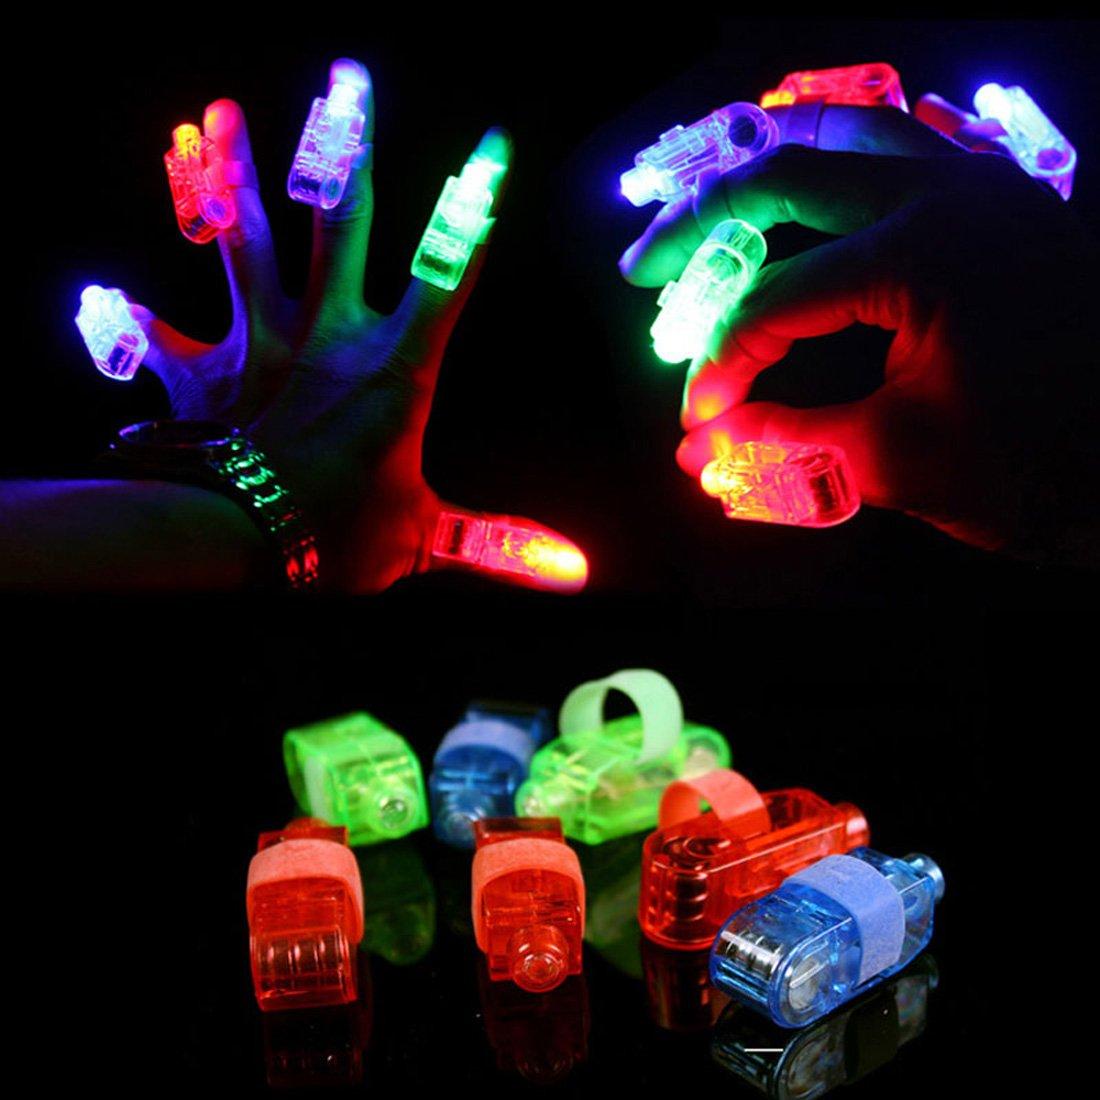 Syolee LED Finger Lights 40pcs Super Bright Finger Flashlight Ideal for Toys Party Favor Supplies .